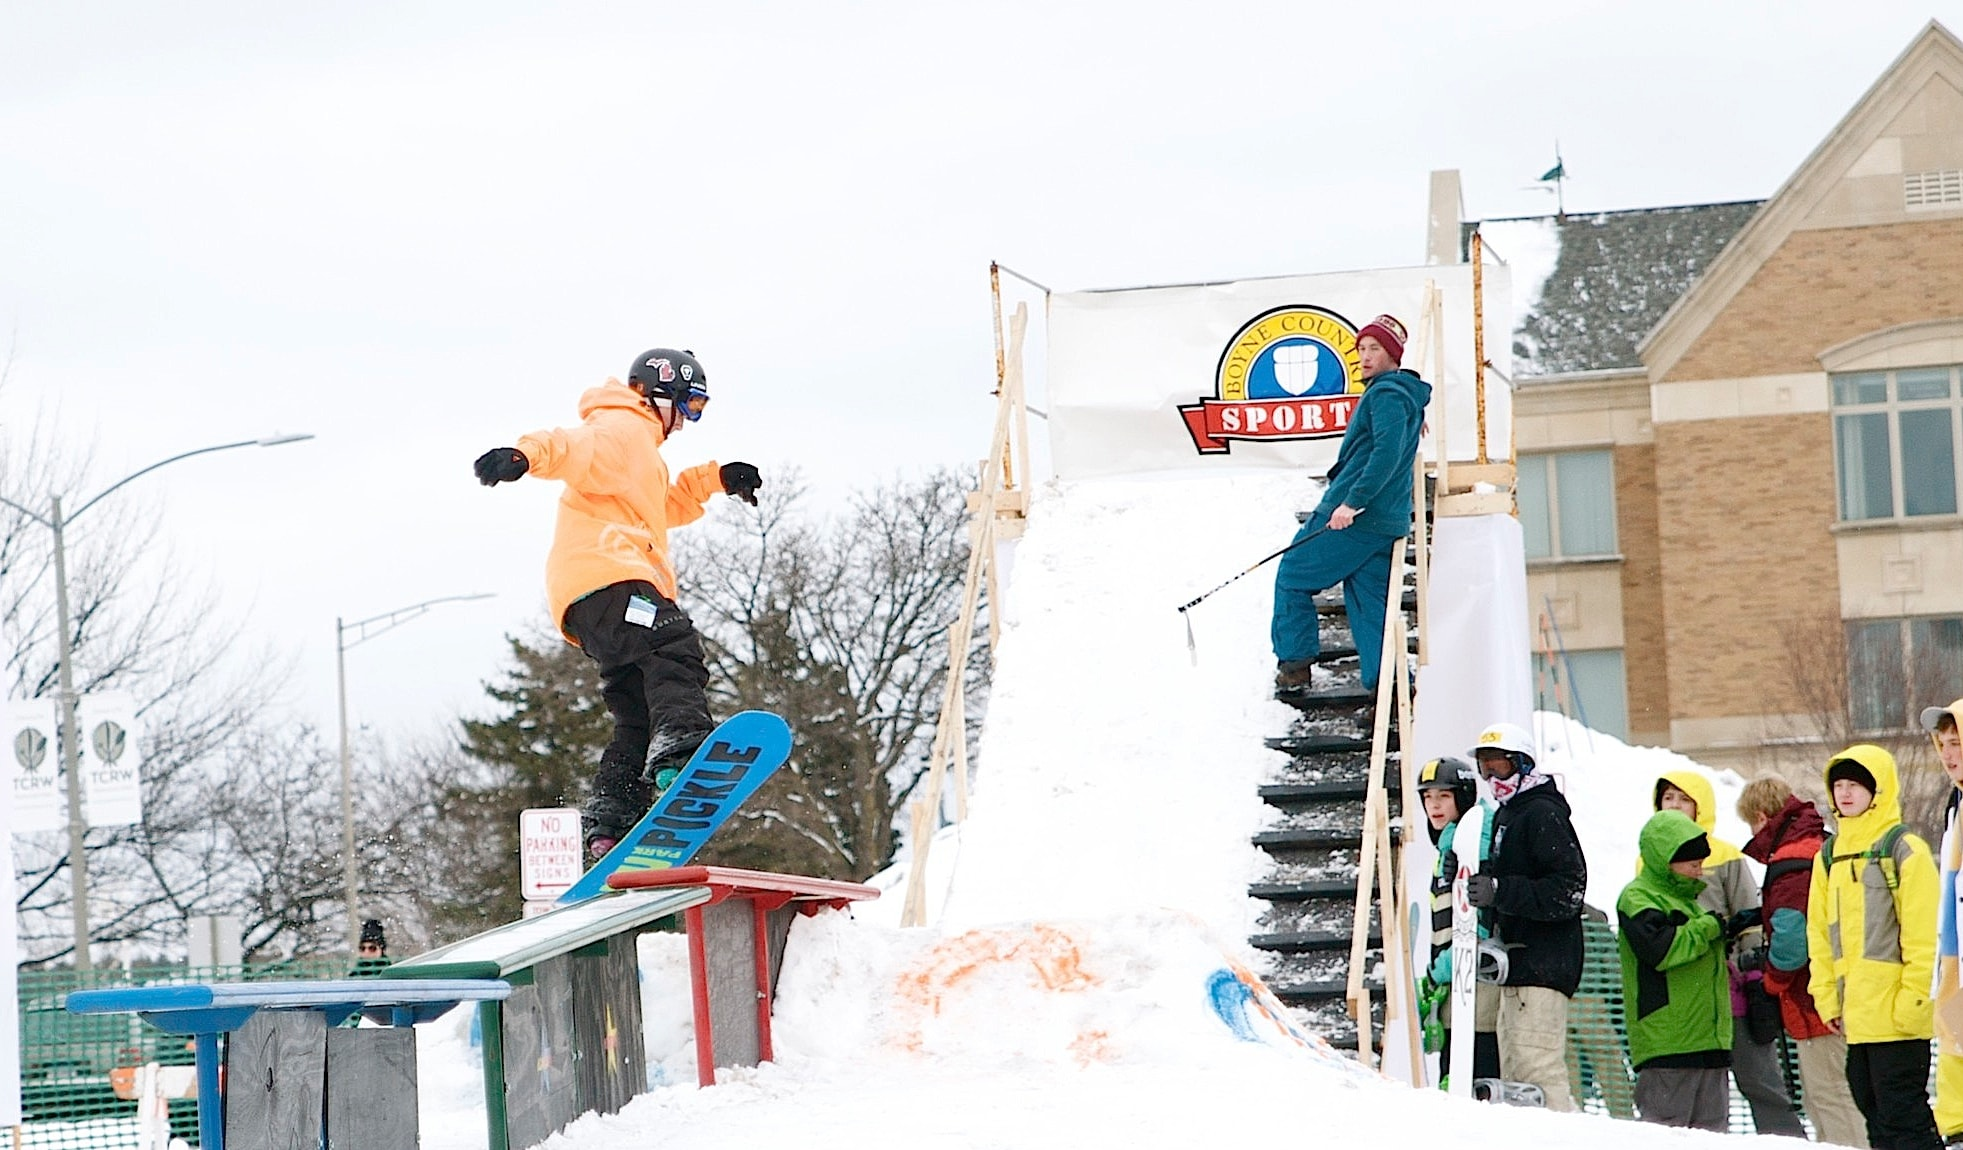 Northern michigan festivals in winter for Craft shows in traverse city mi